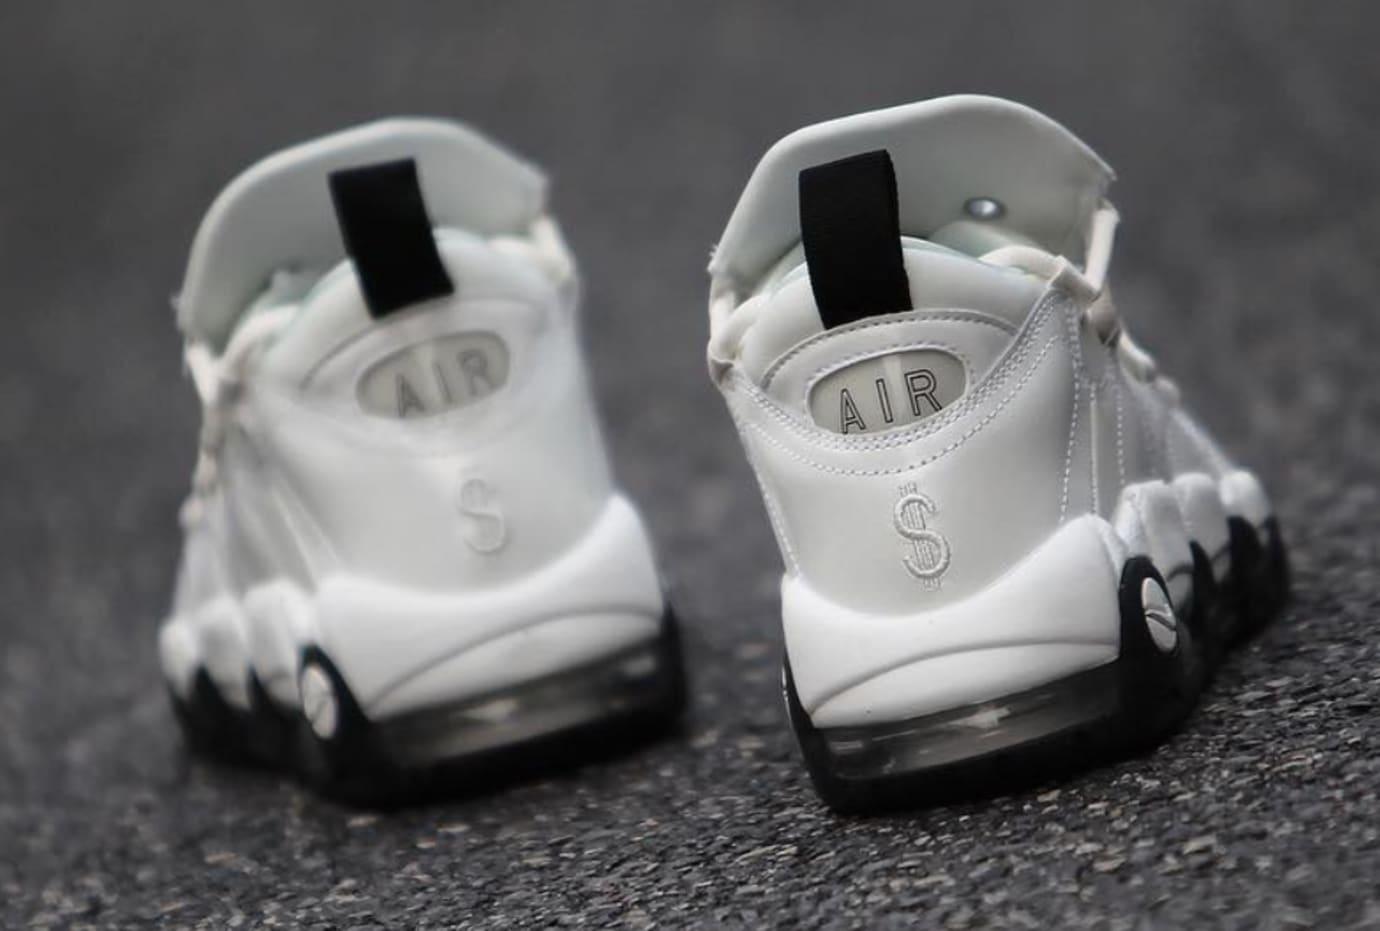 Nike Air More Money 'White/Los Angeles' (Heel)